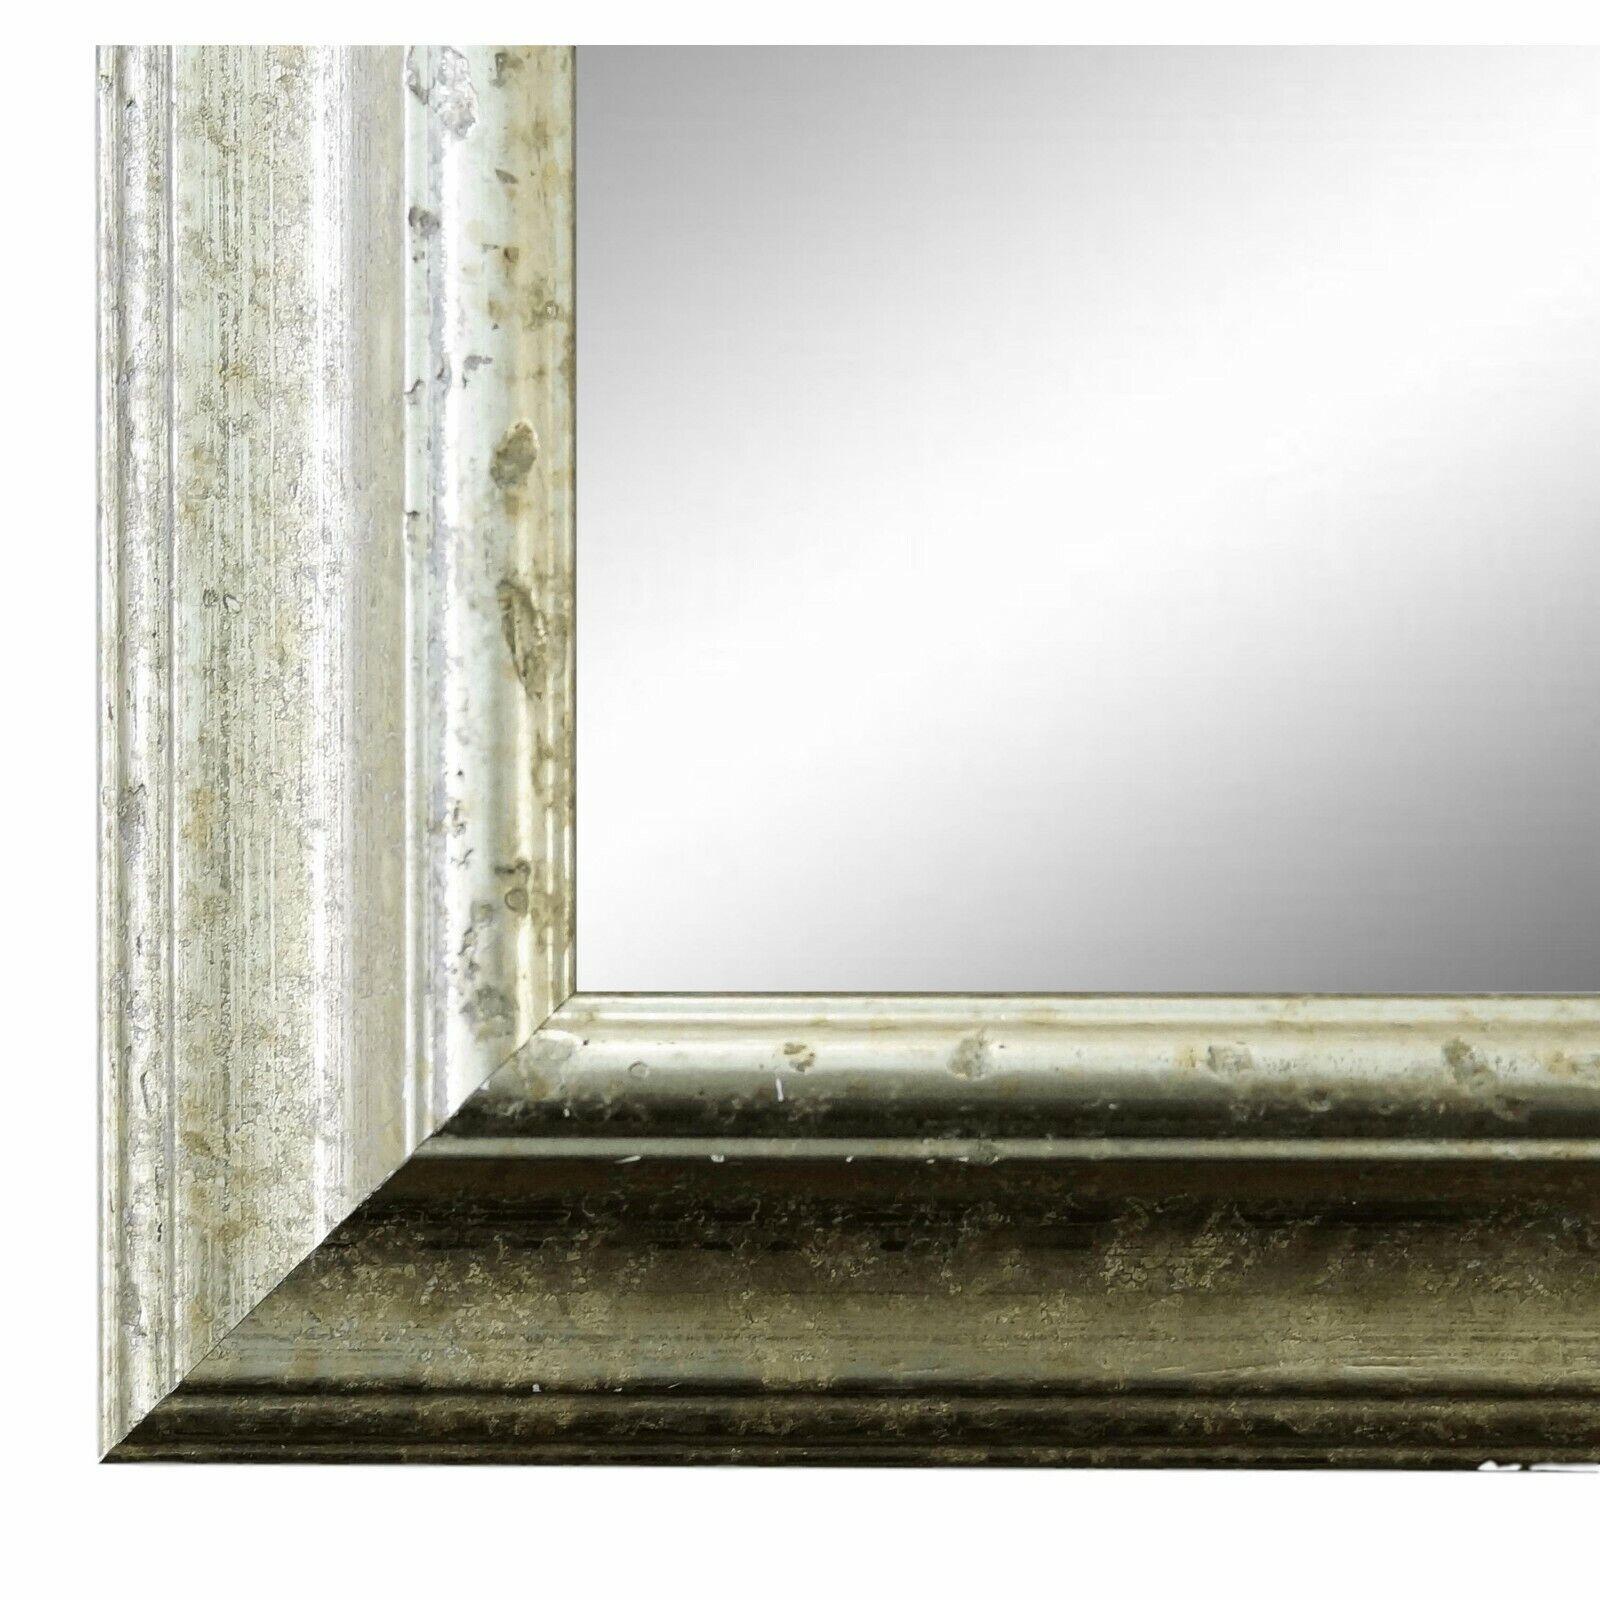 Spiegel Wandspiegel Bad Flur Holz Klassisch Retro Genua Silber 4,3 - NEU